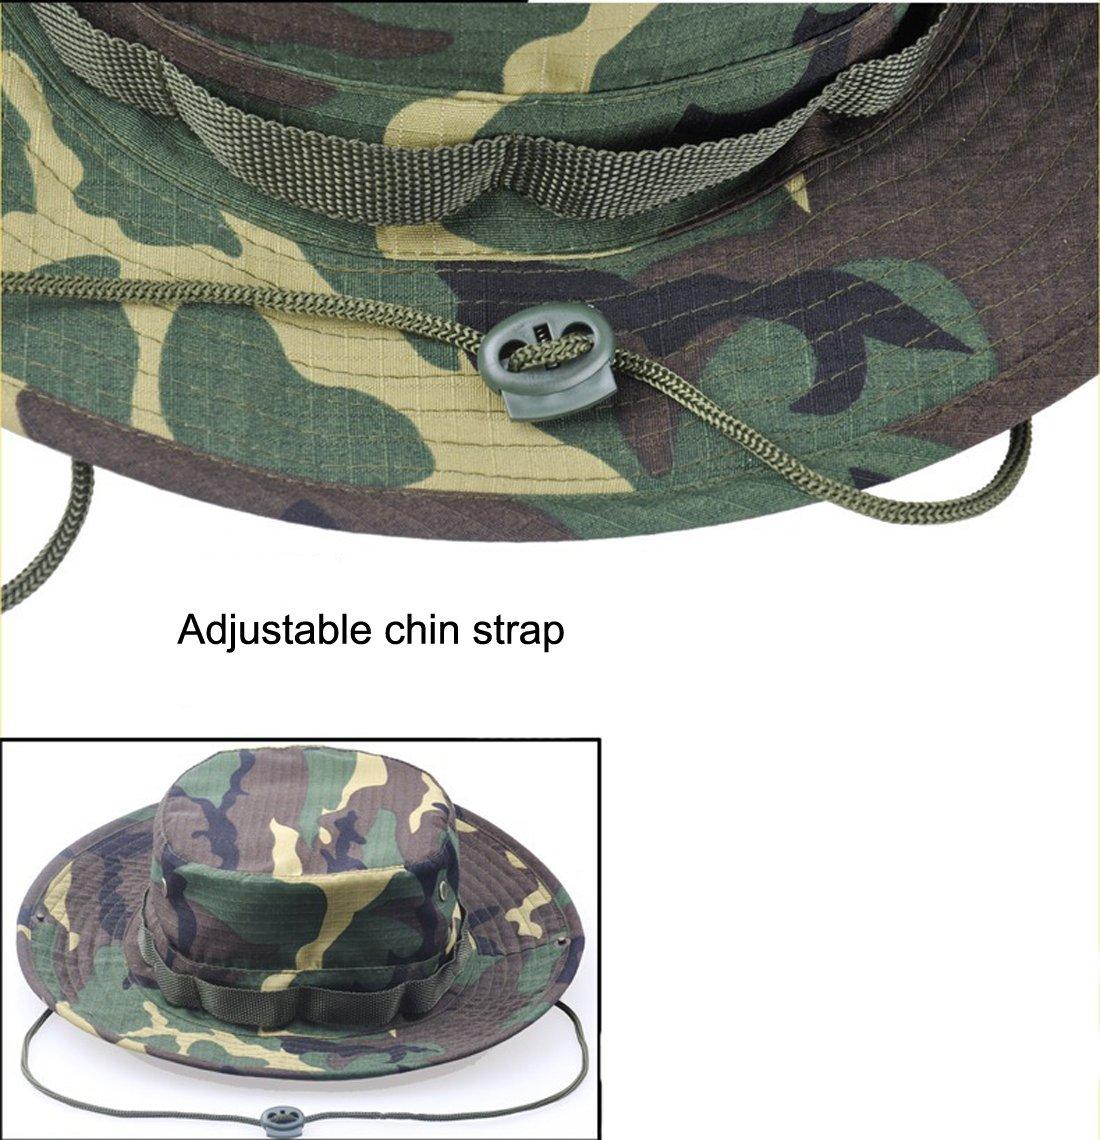 0bafa5e5191 Amazon.com   JITTY Wide Brim Military Bucket Boonie Sun Hat for Summer  Outdoor Hiking Fishing Gardening Hunting Camping Wargame (Army Green)    Sports   ...